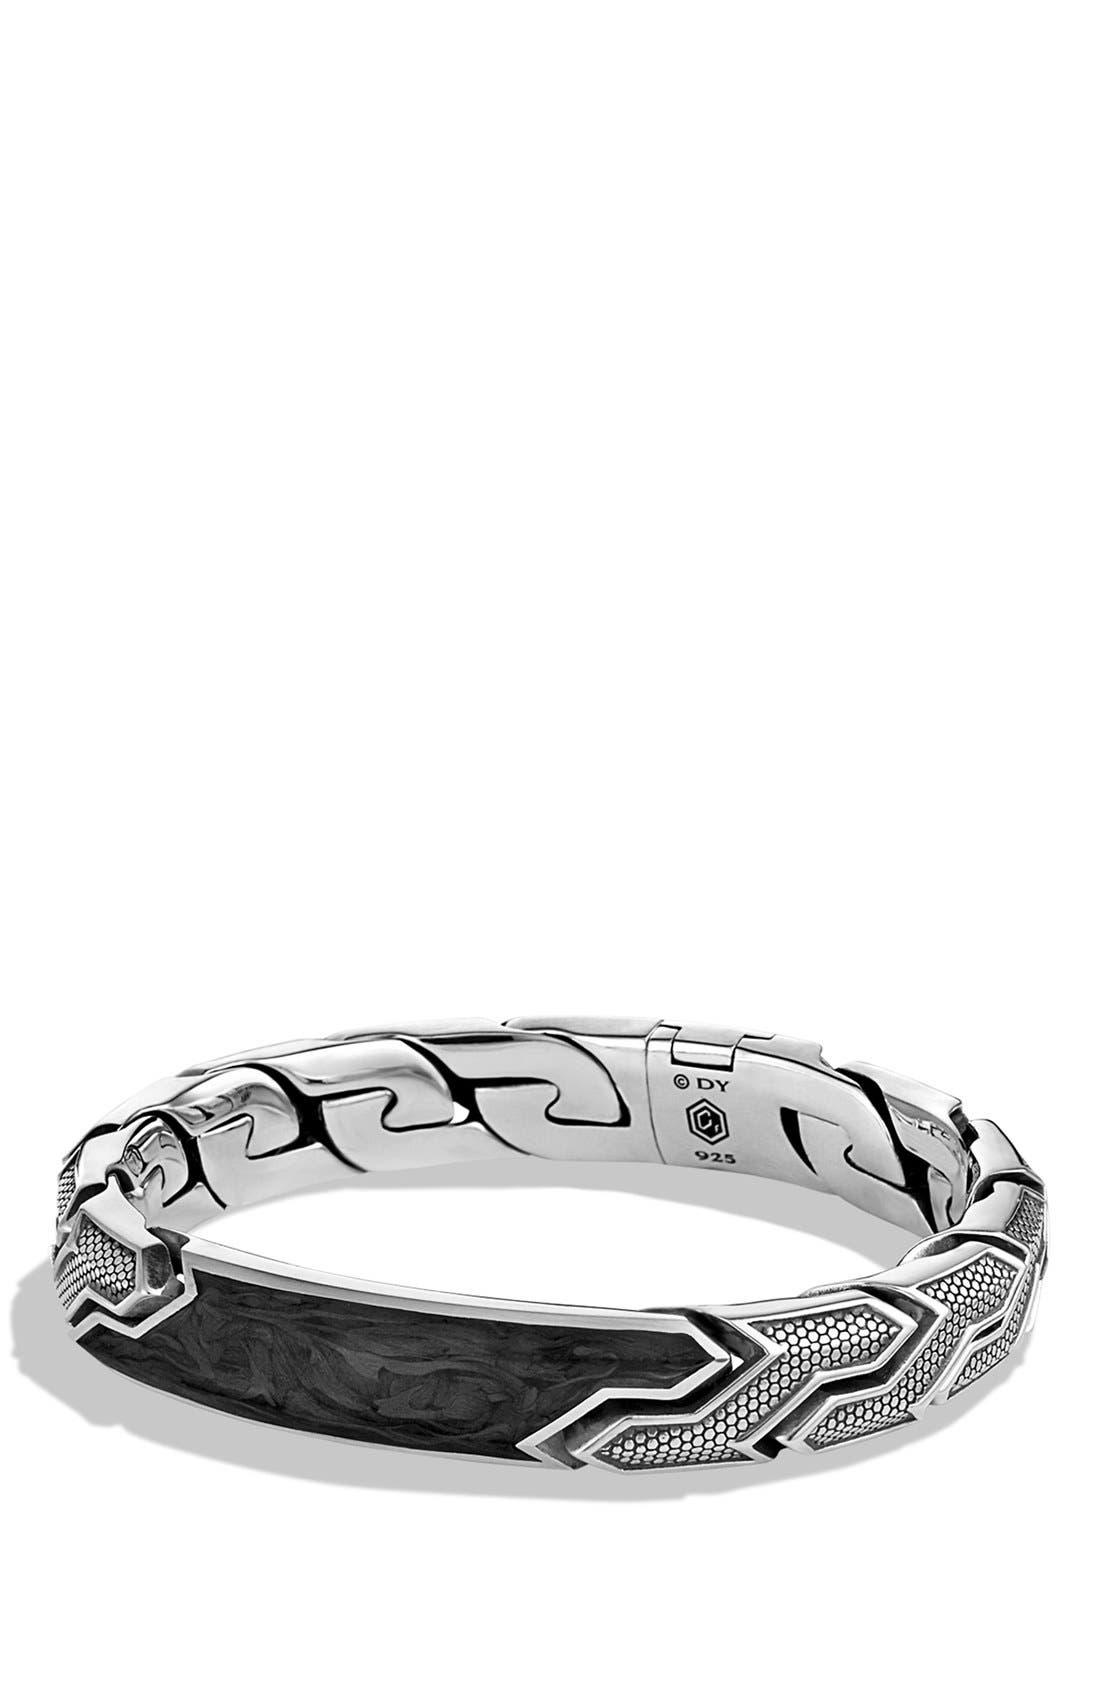 DAVID YURMAN, Forged Carbon ID Bracelet, Main thumbnail 1, color, FORGED CARBON